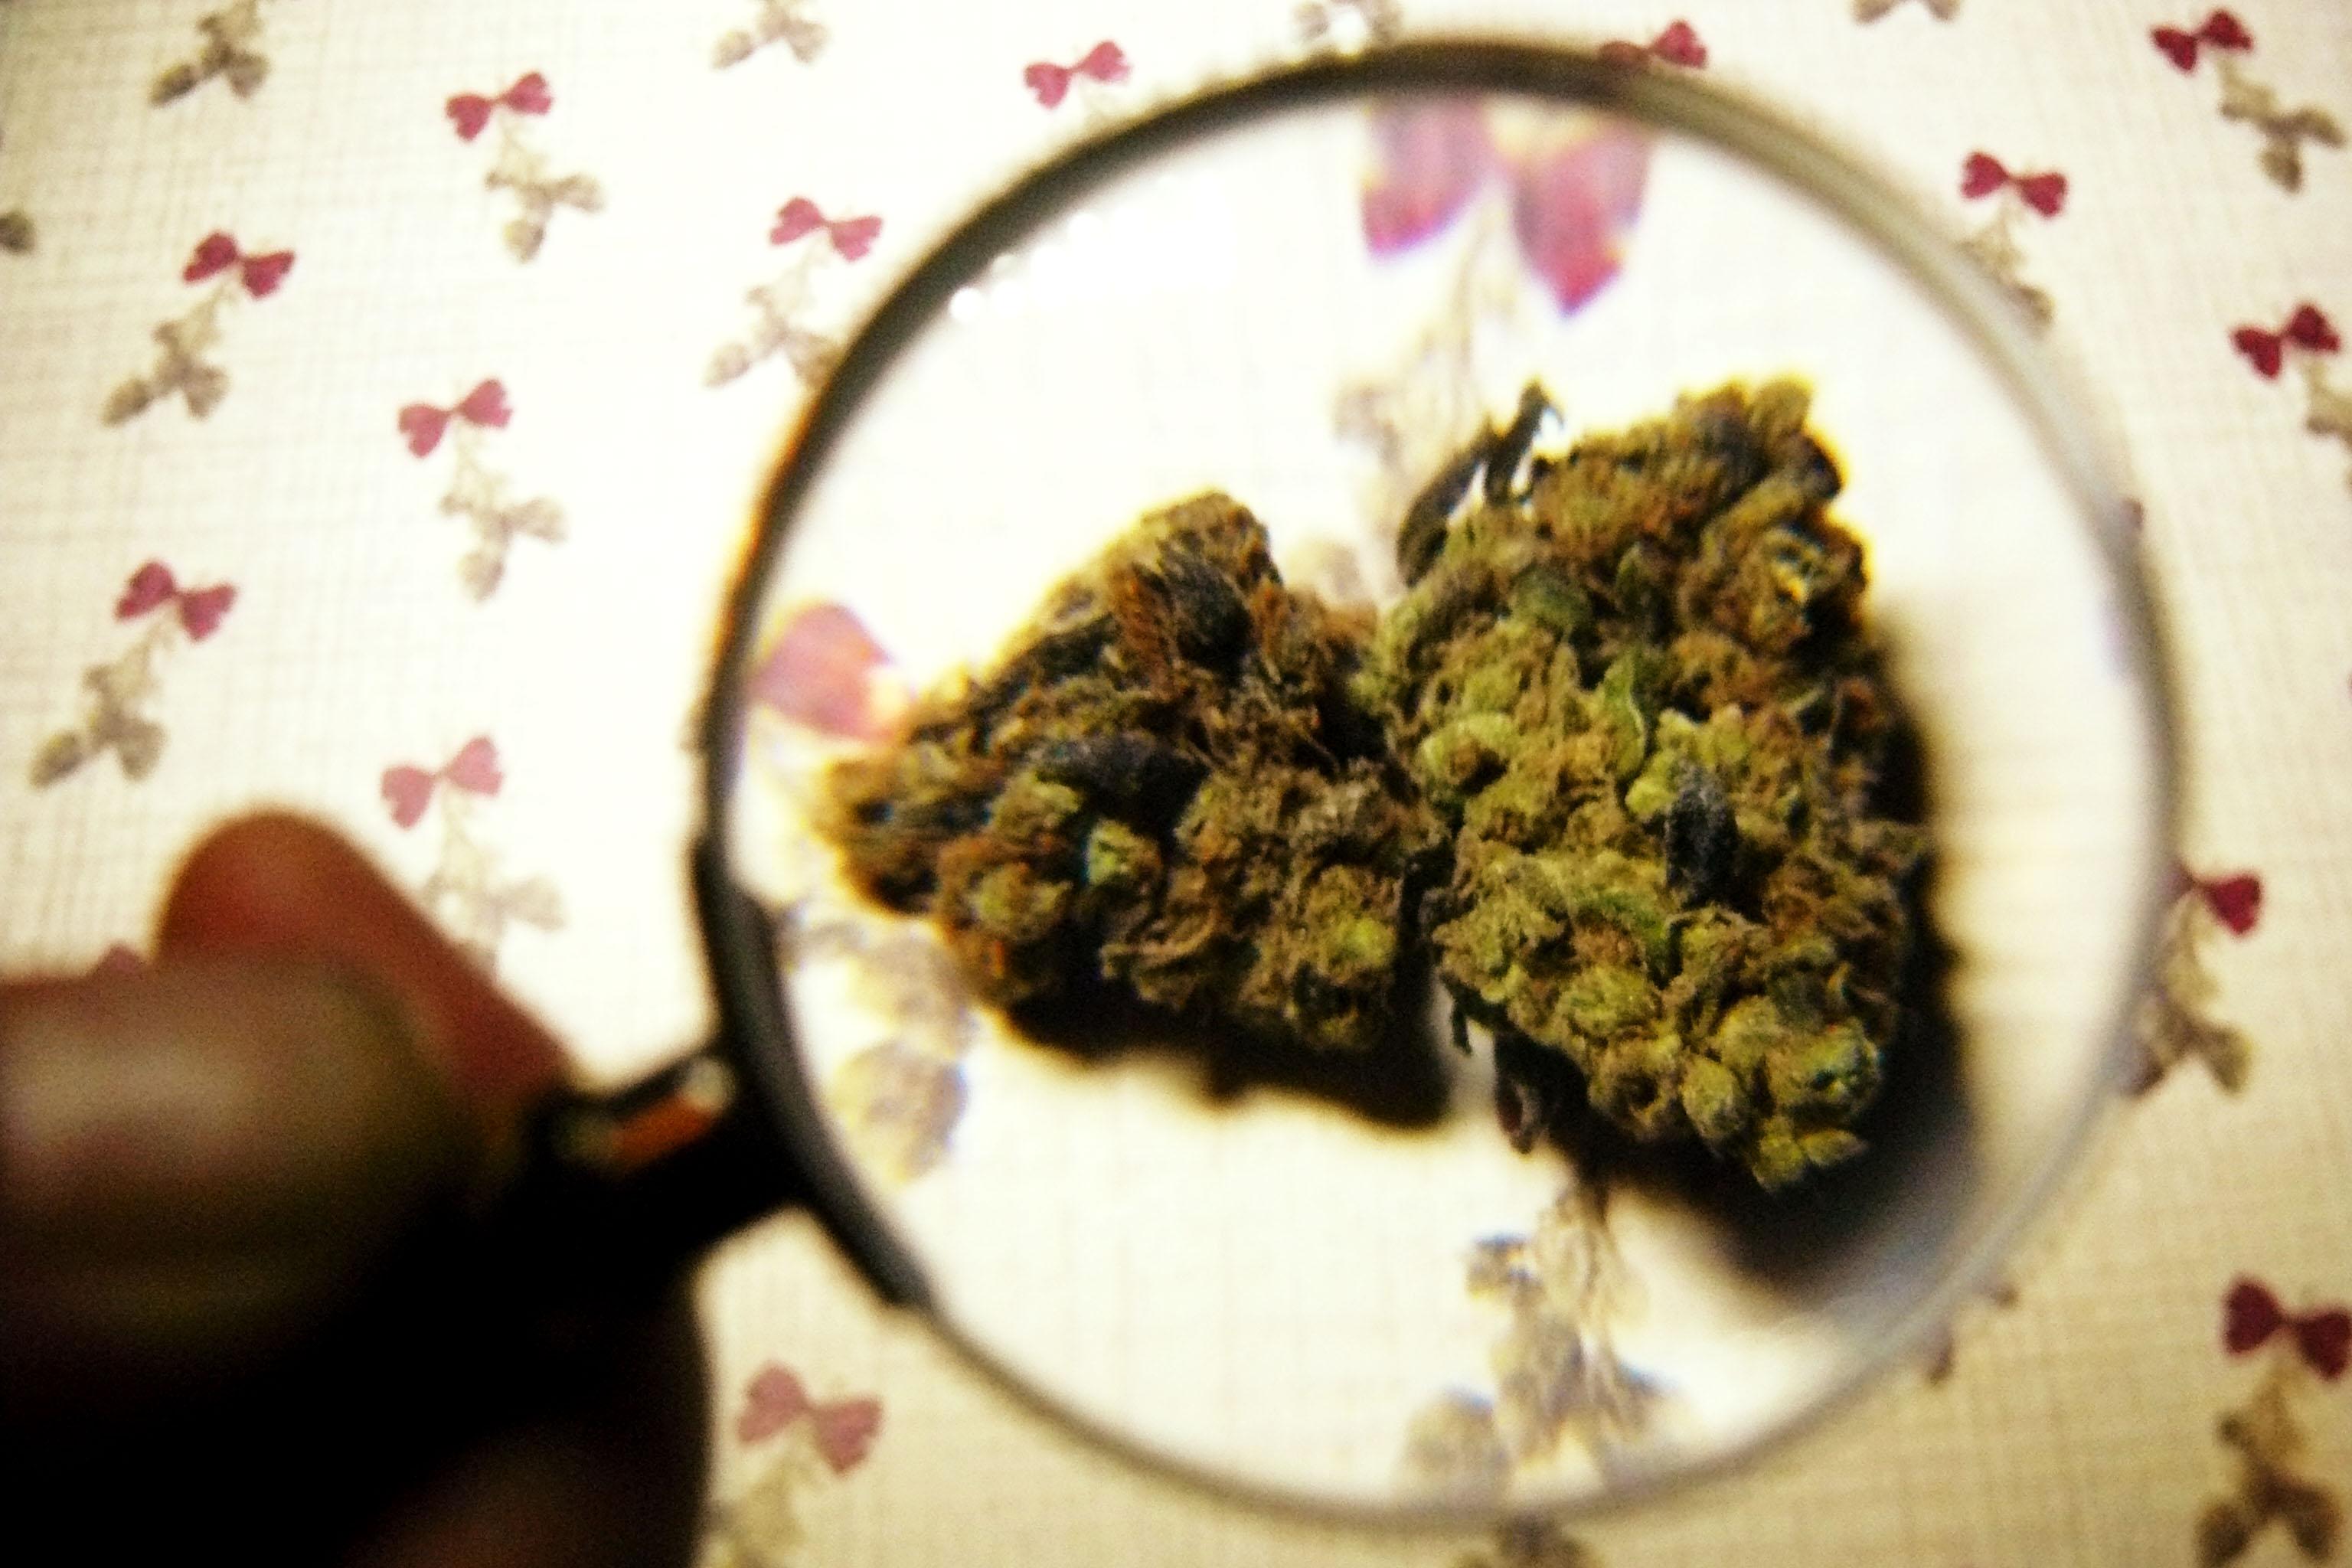 Marijuana may help HIV patients keep mental stamina longer